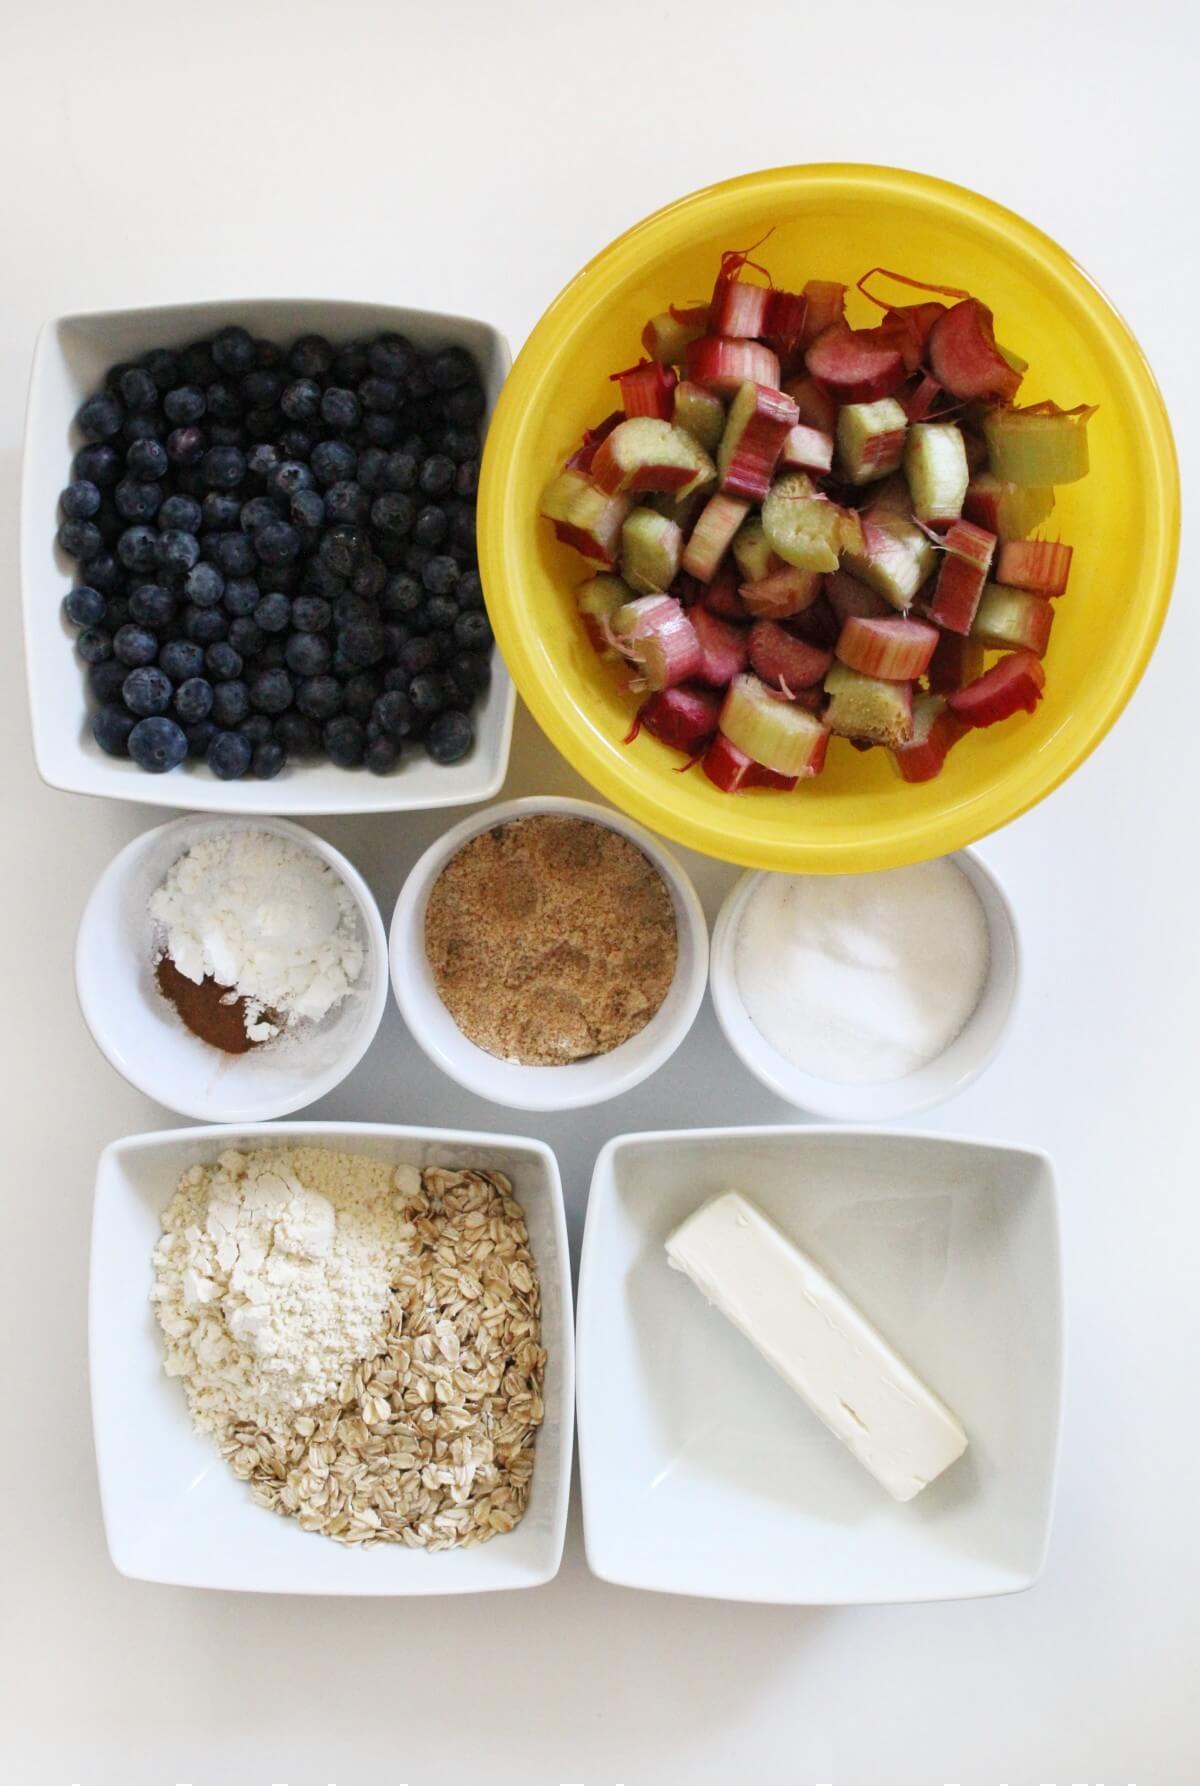 ingredients for blueberry rhubarb crisp